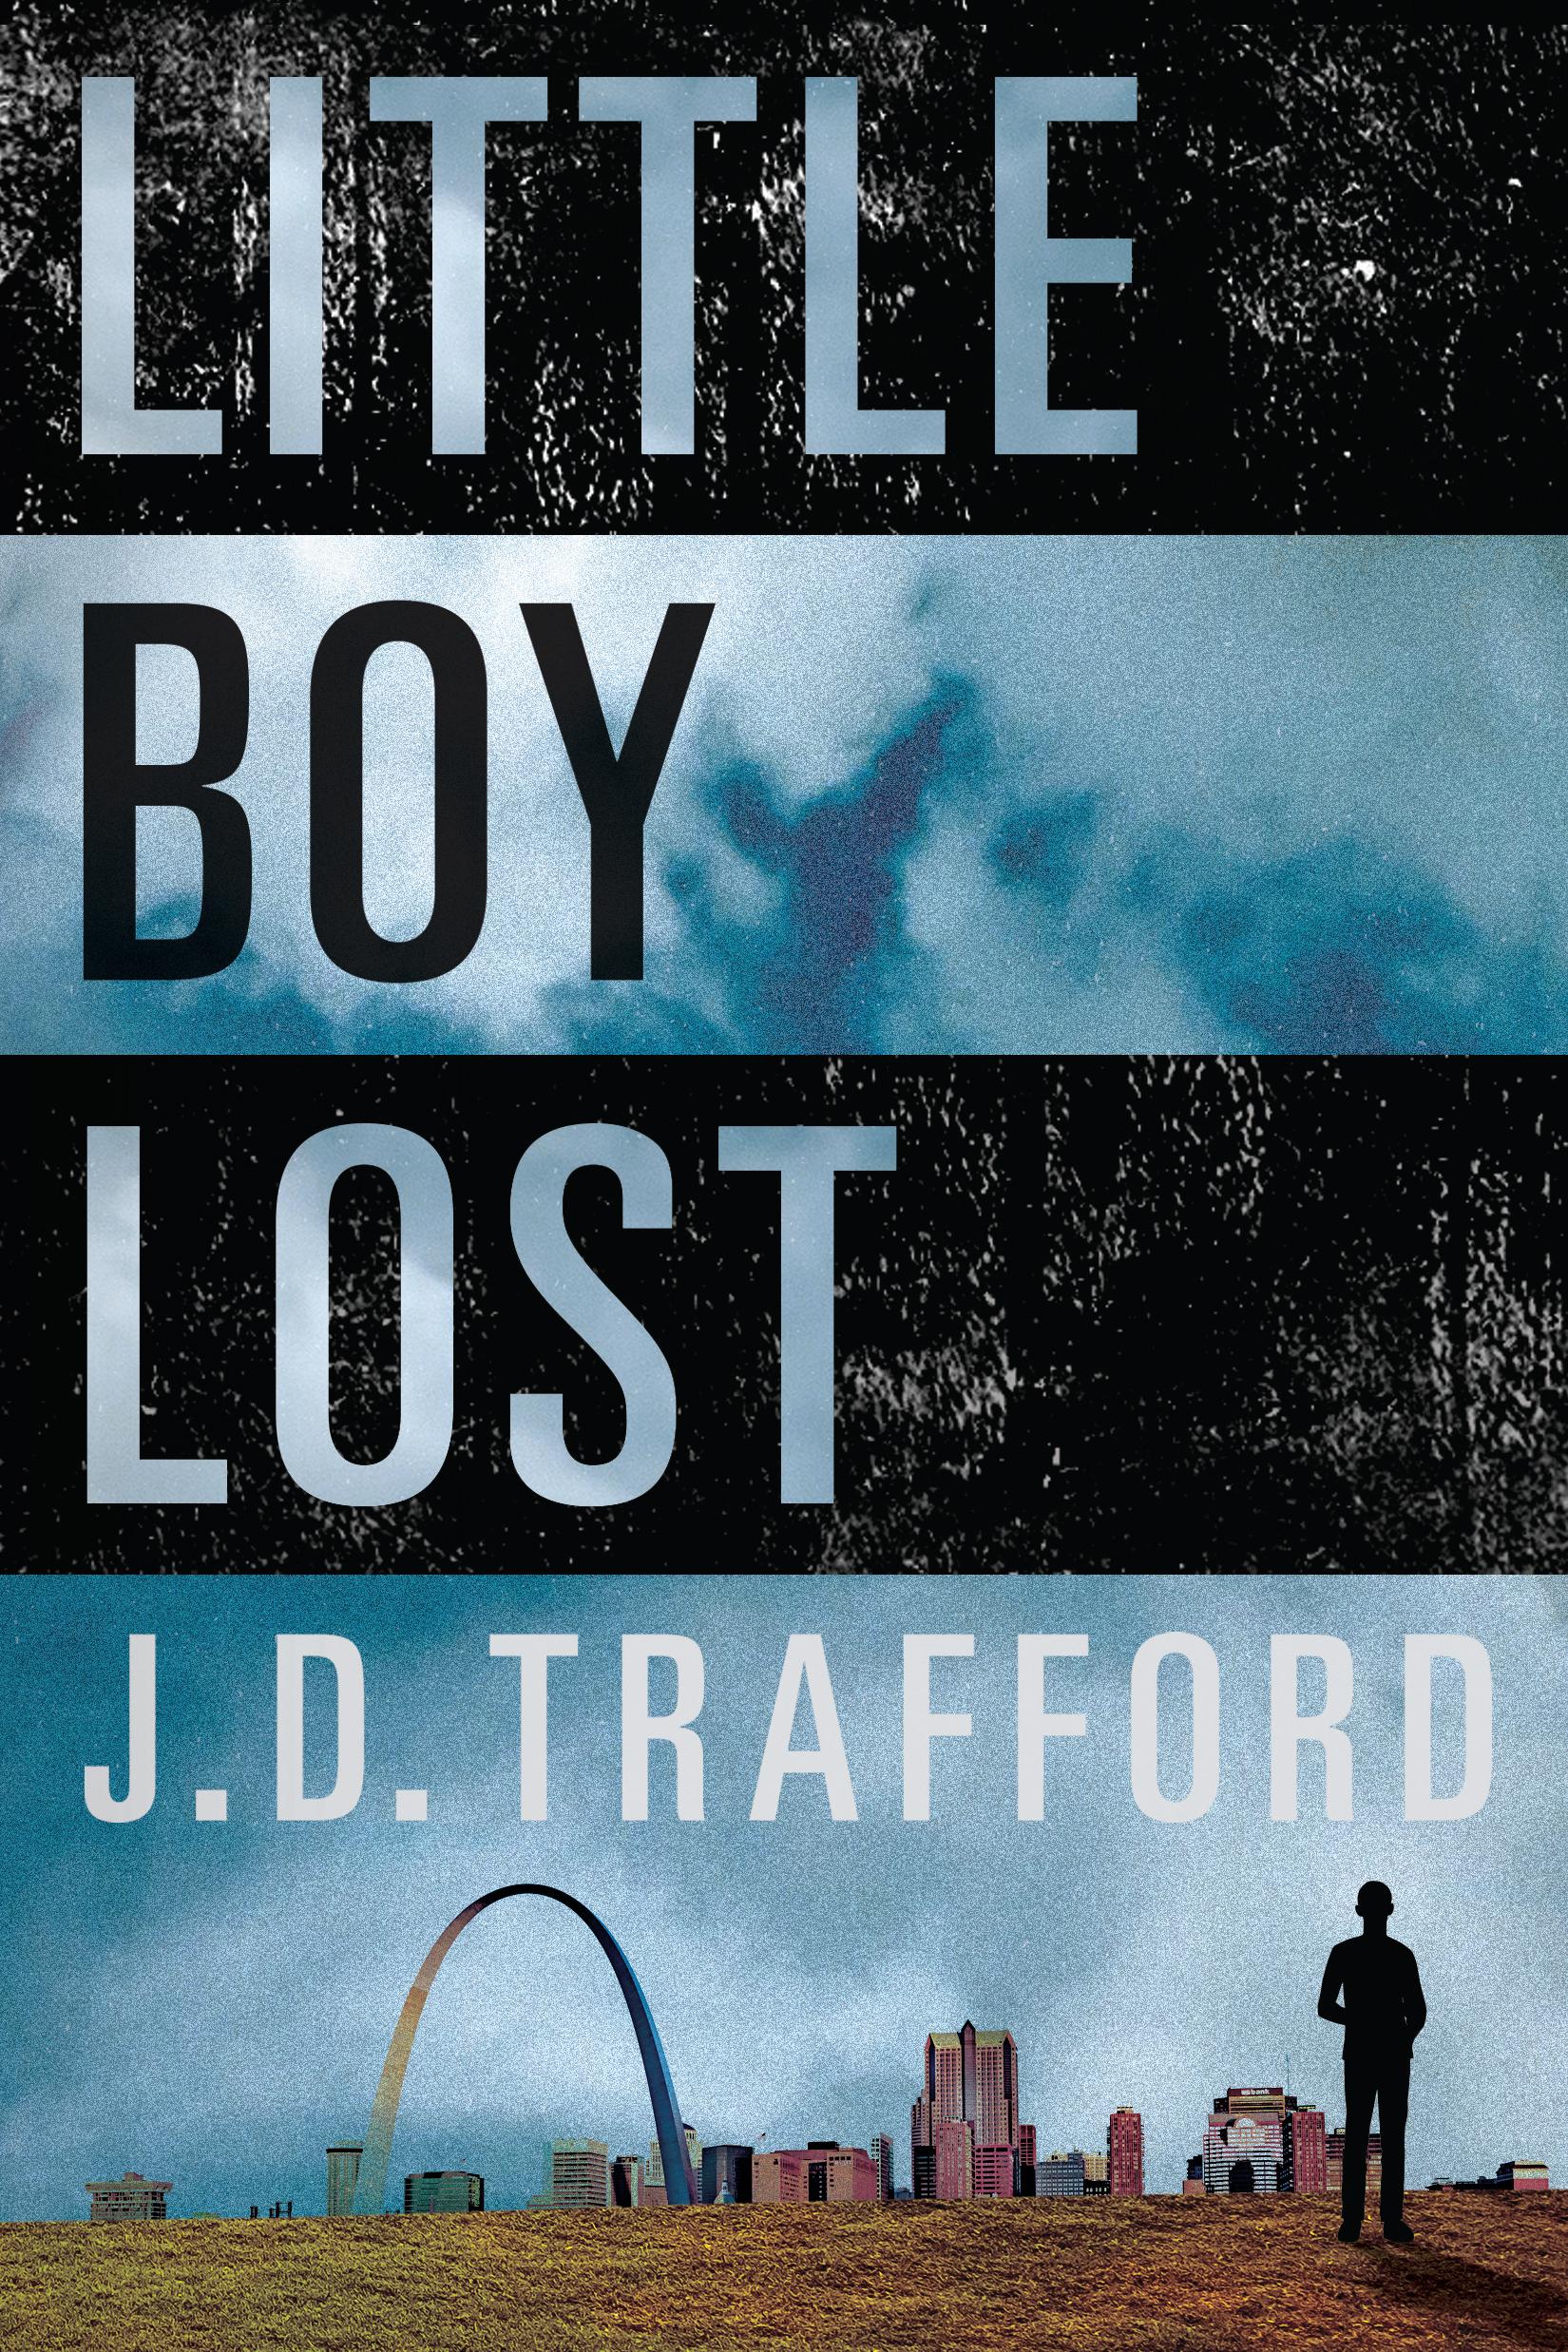 Trafford-Little Boy Lost-23574-CV-FT.jpg